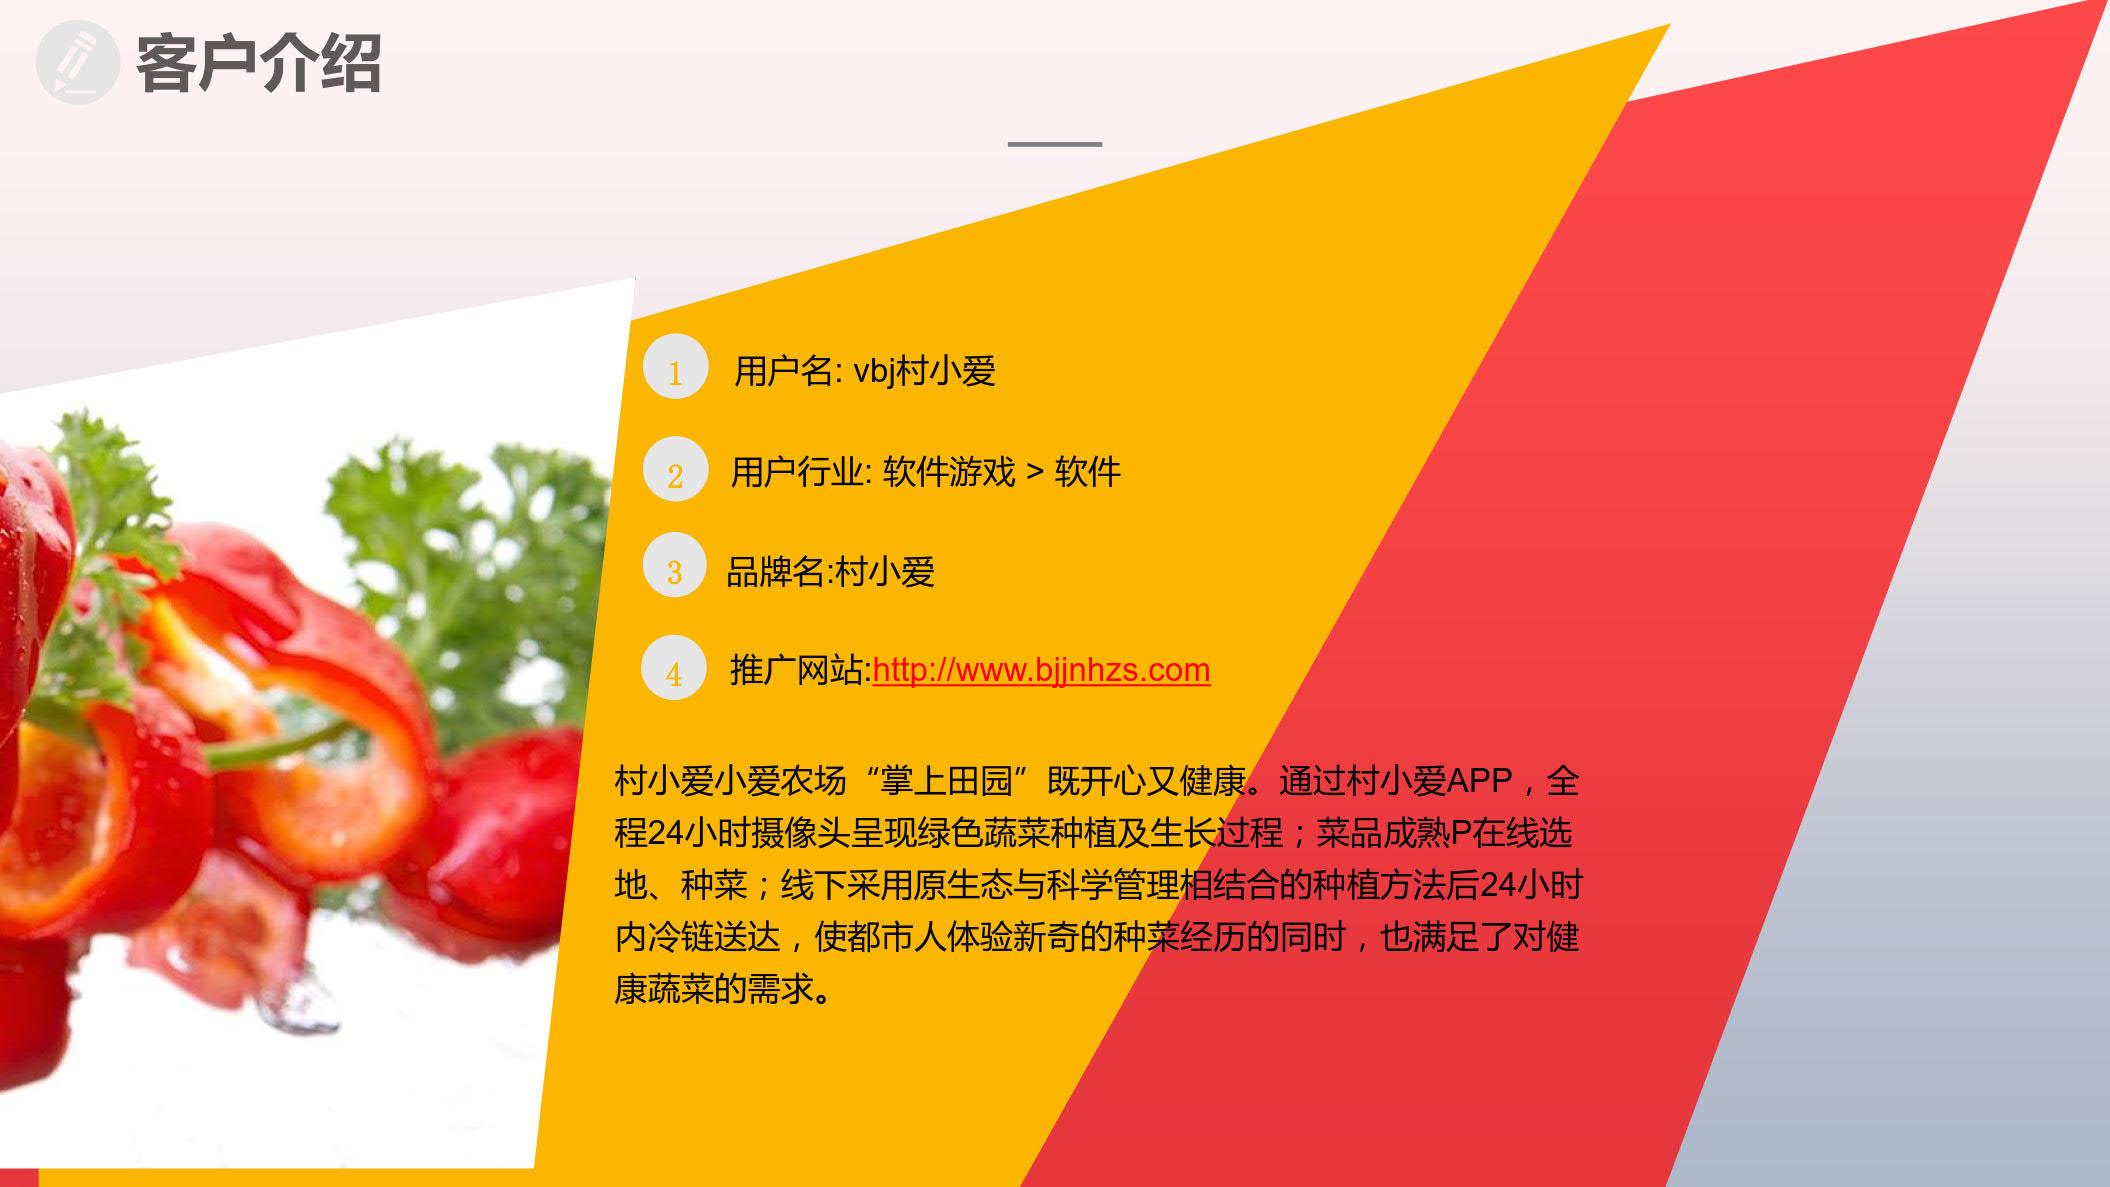 F1+vbj村小爱+软件游戏+张洁0608_6.jpg